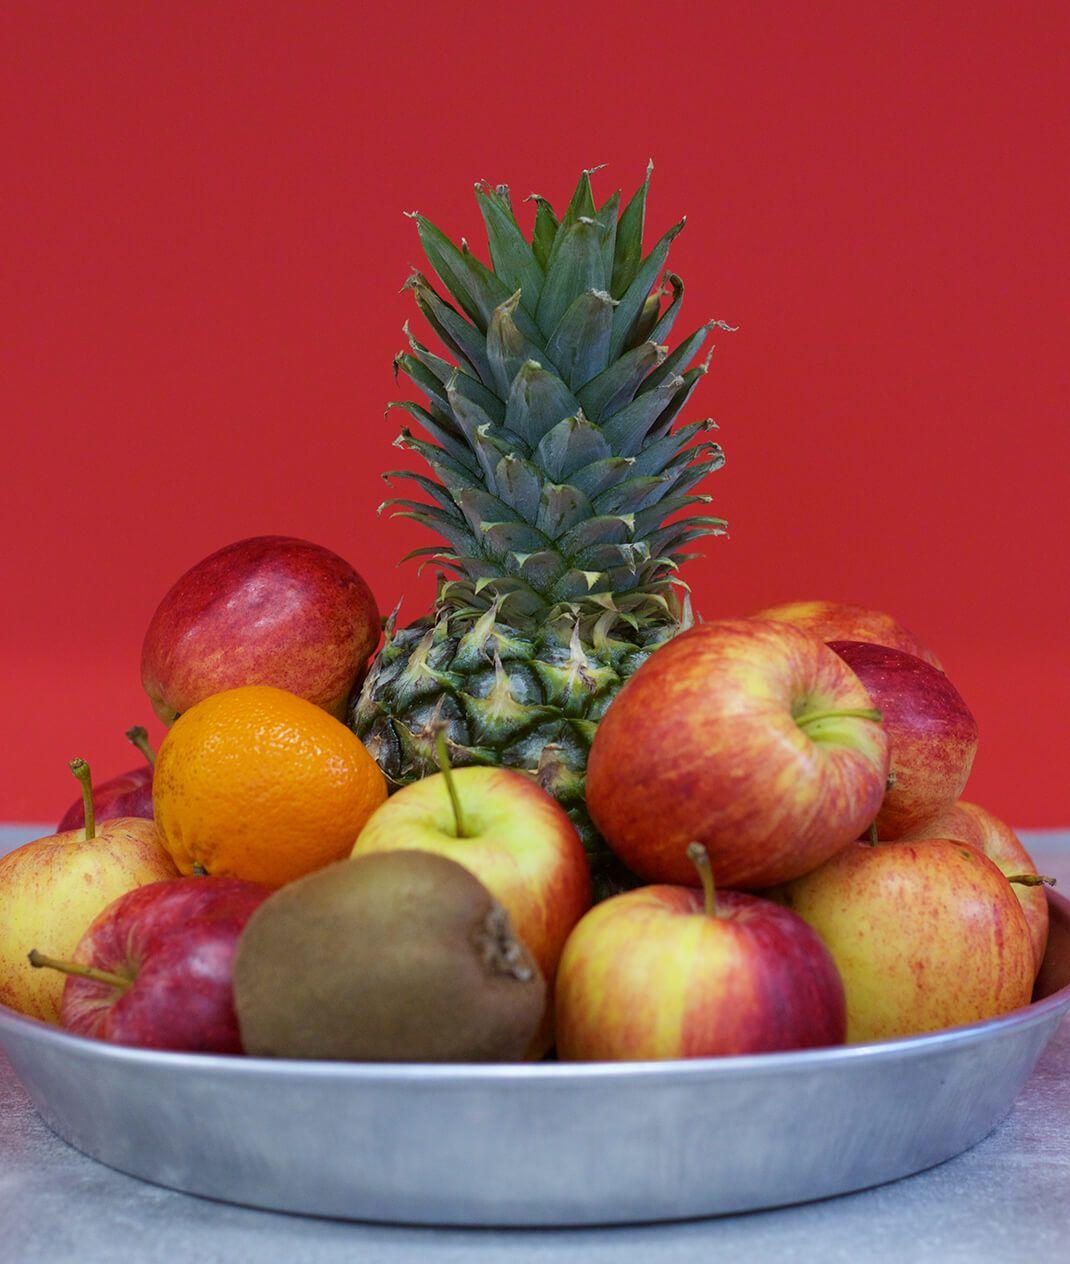 pineapple apples orange kiwi in fruit bowl